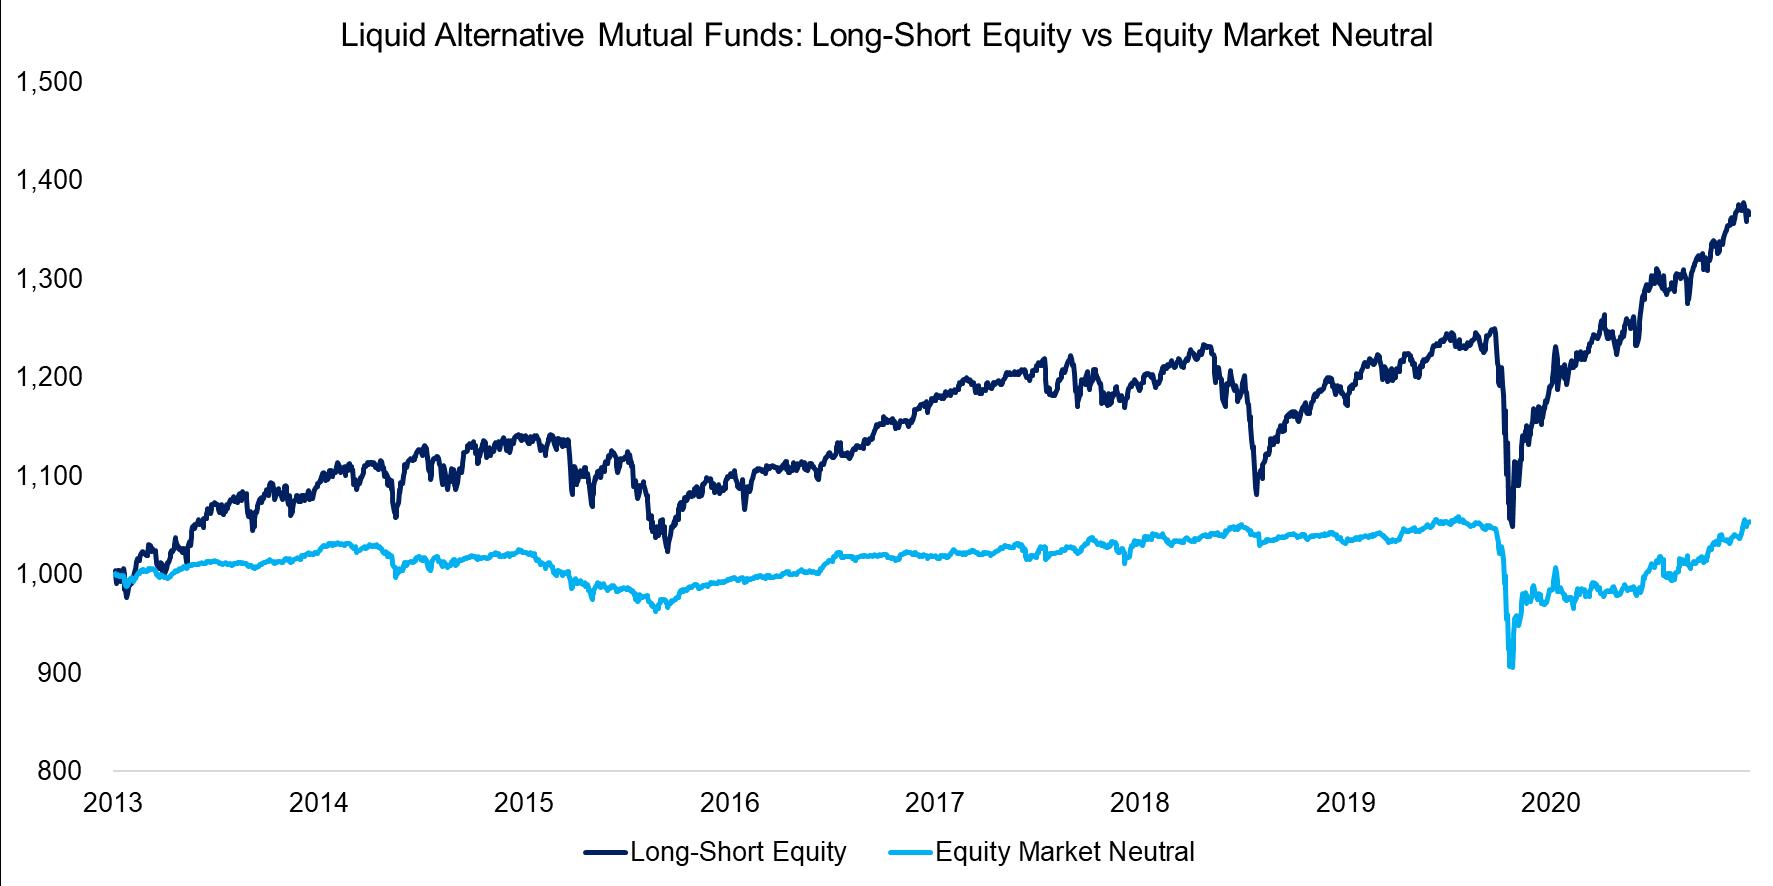 Liquid Alternative Mutual Funds Long-Short Equity vs Equity Market Neutral